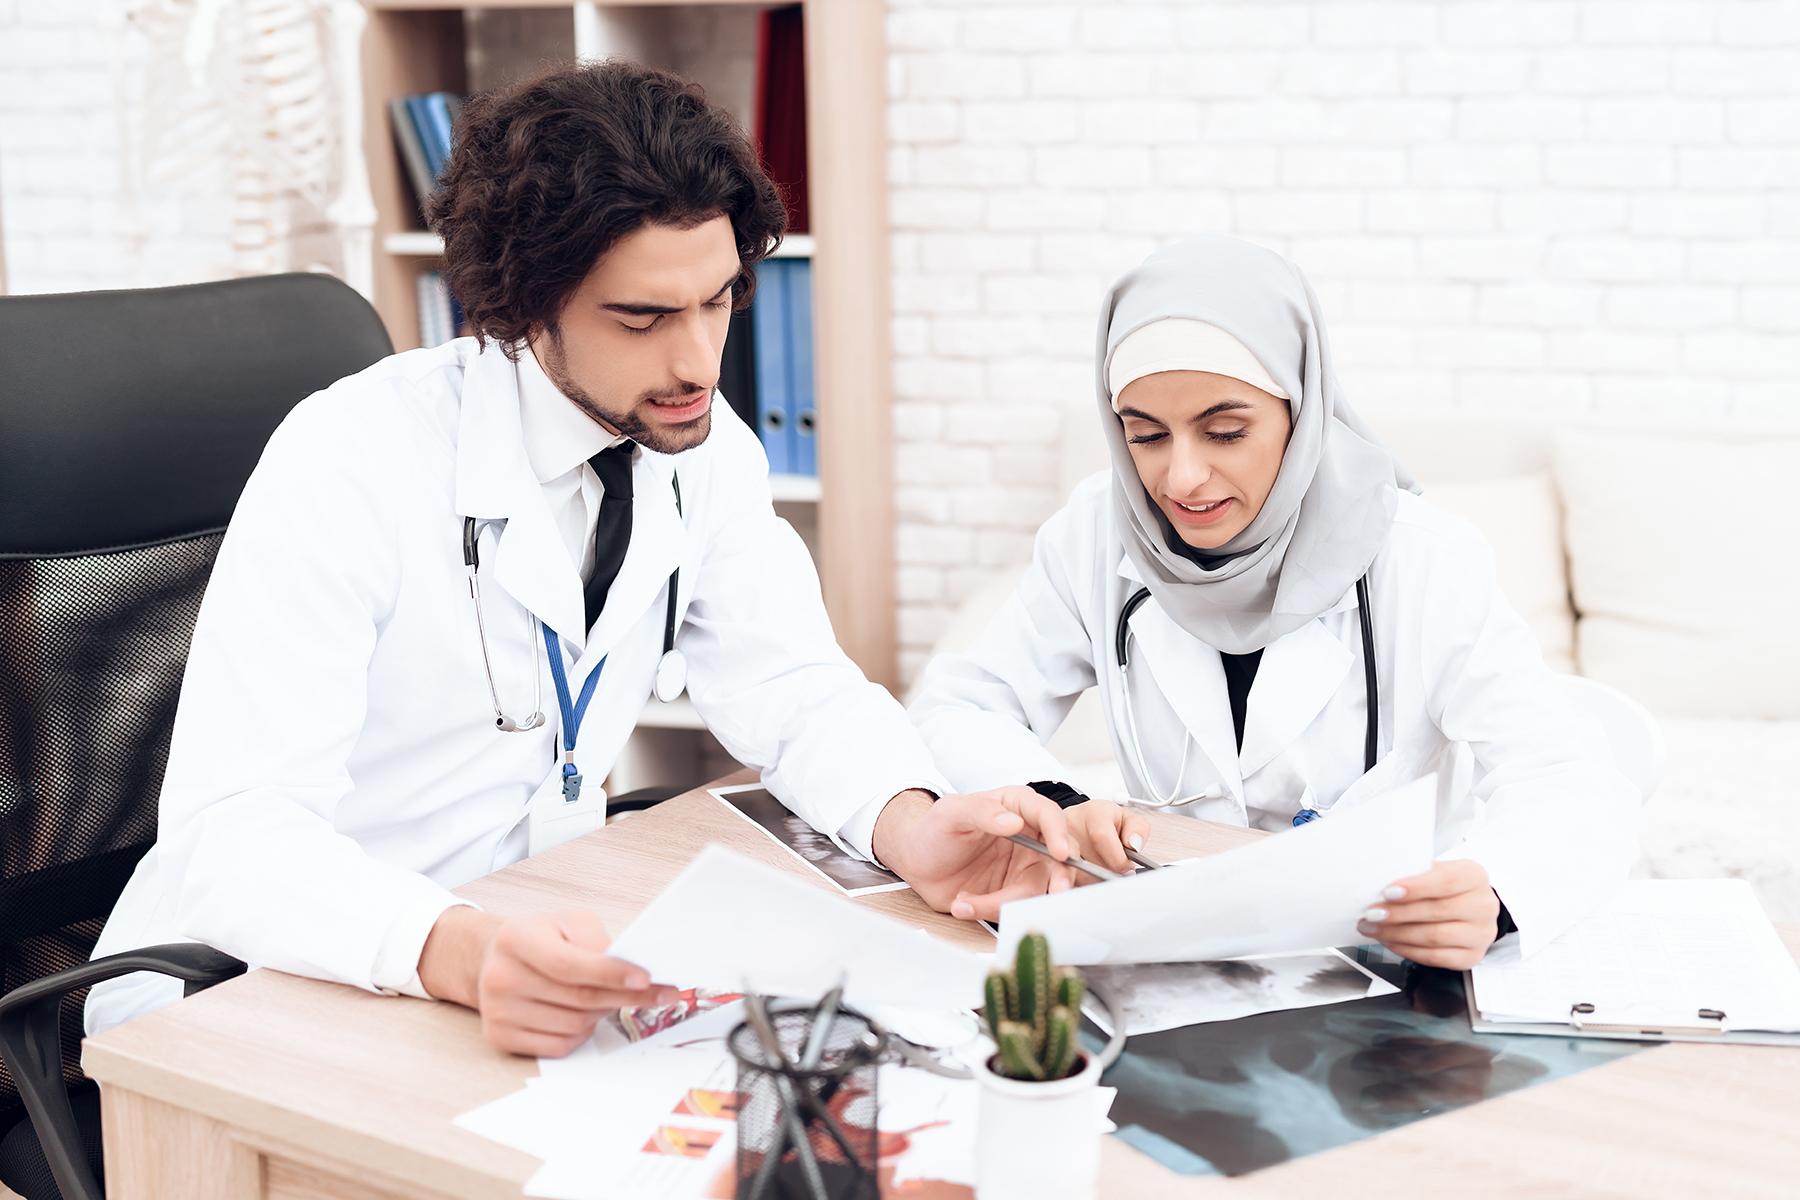 Two Saudi doctors